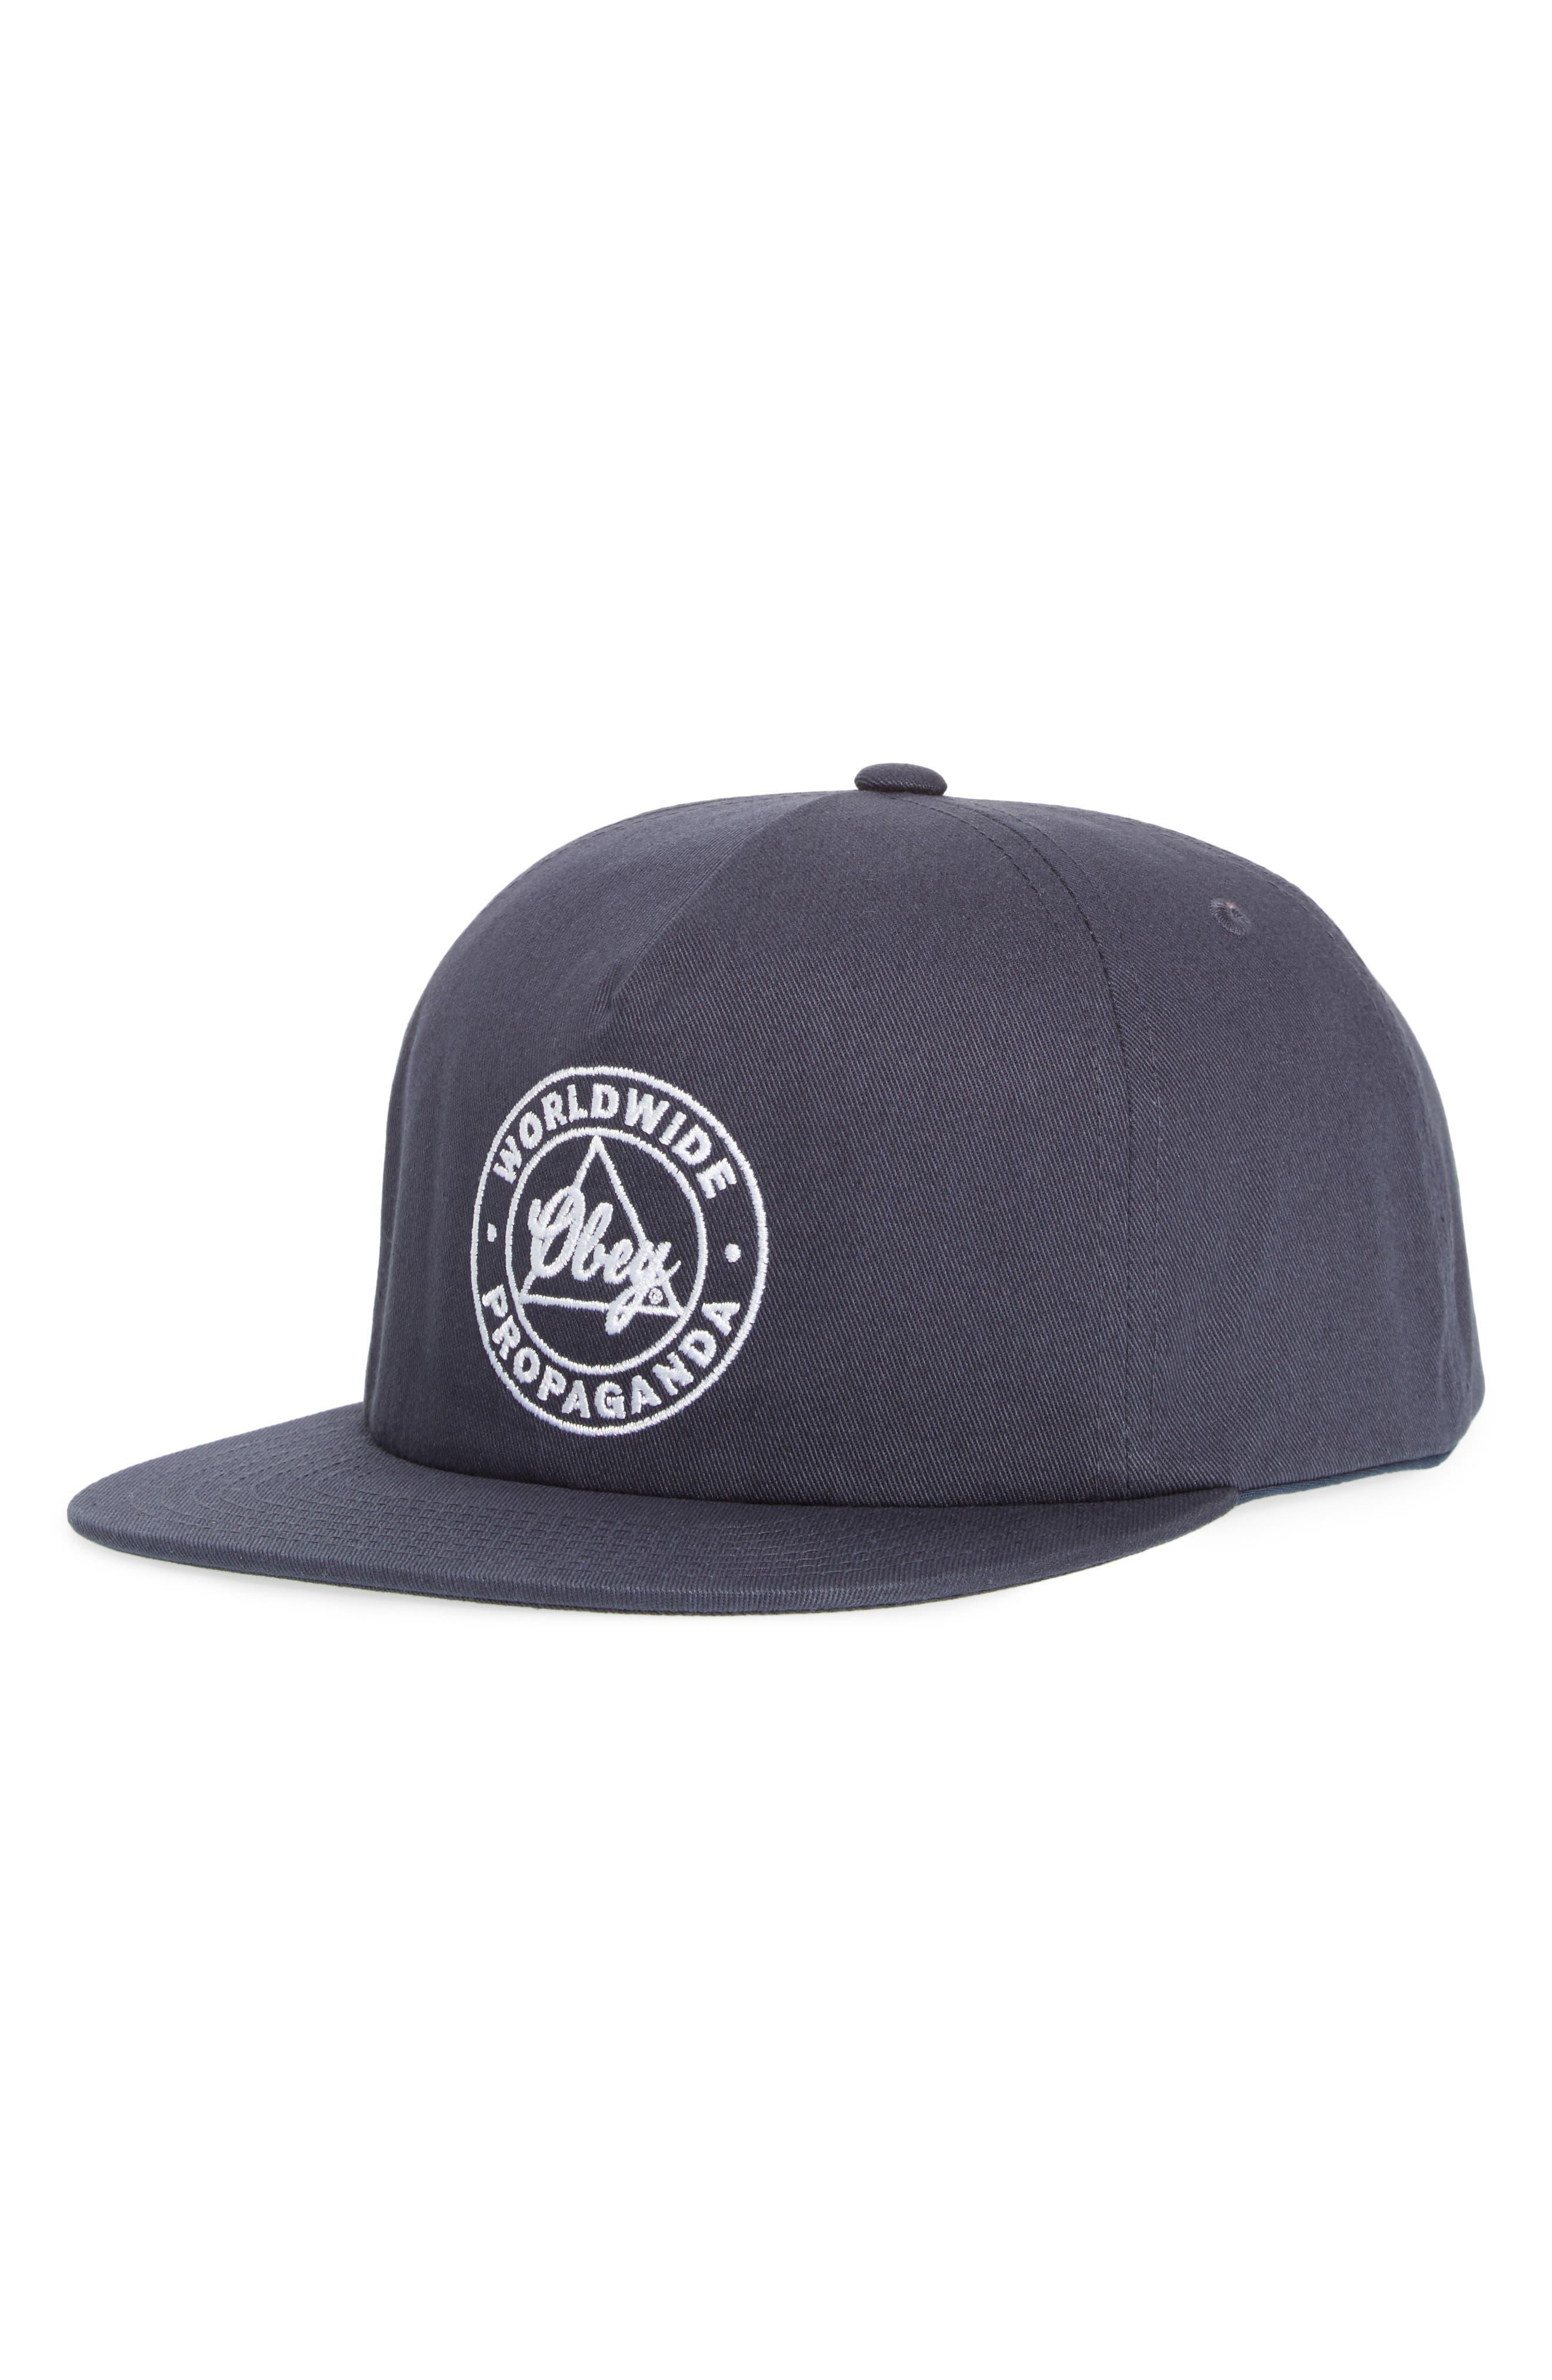 Worldwide Propaganda II Snapback Cap,                         Main,                         color, Navy